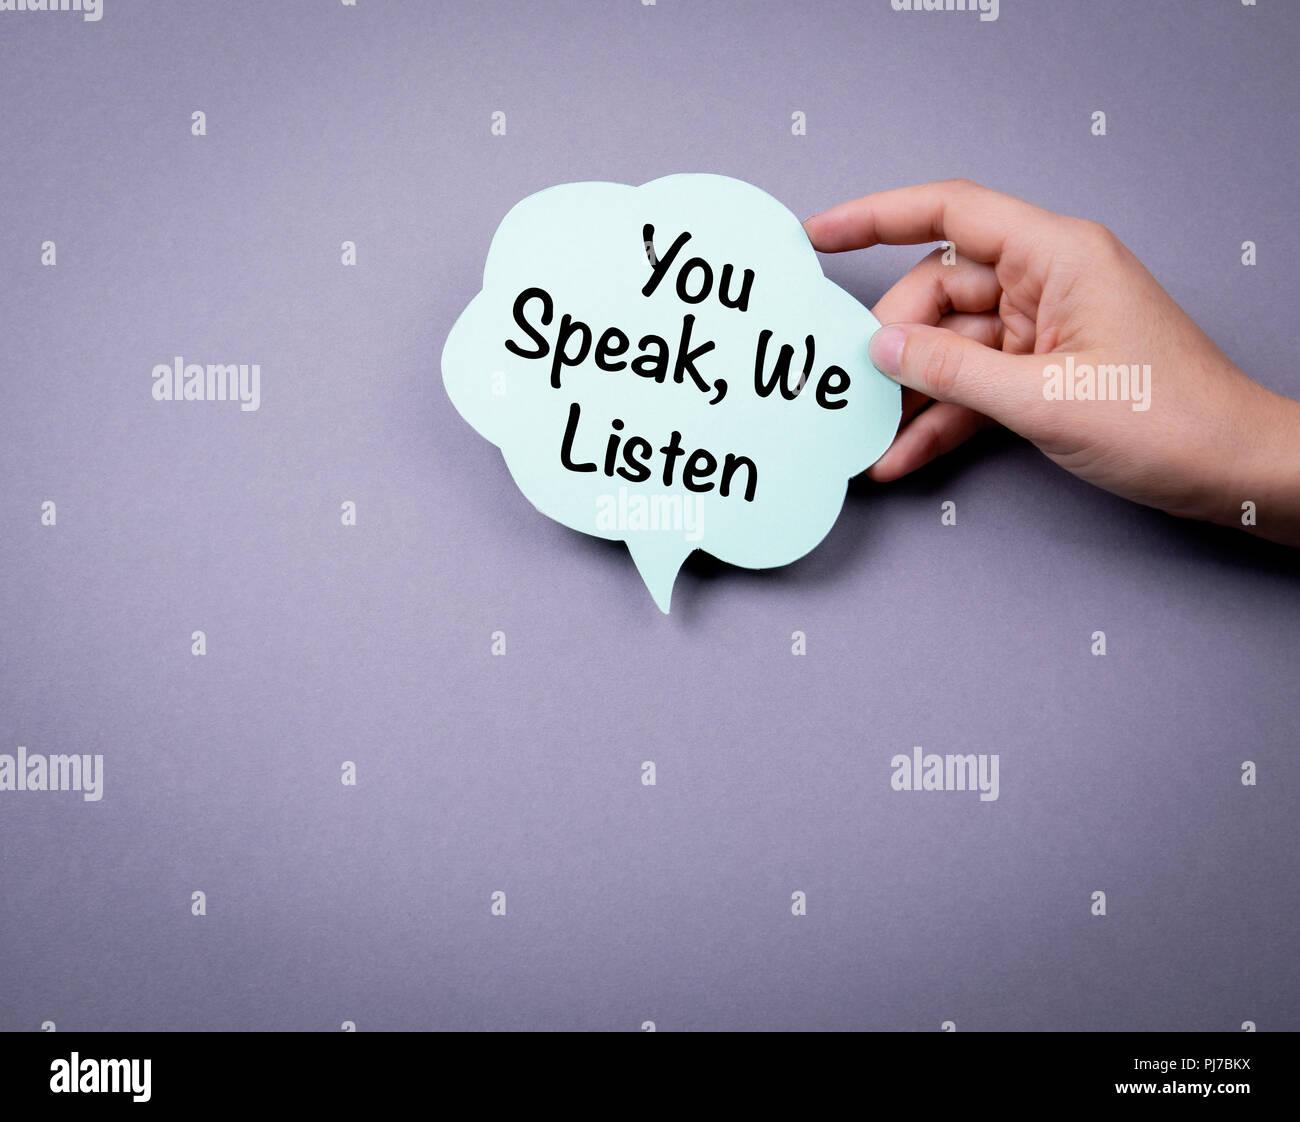 You speak, we listen - Stock Image